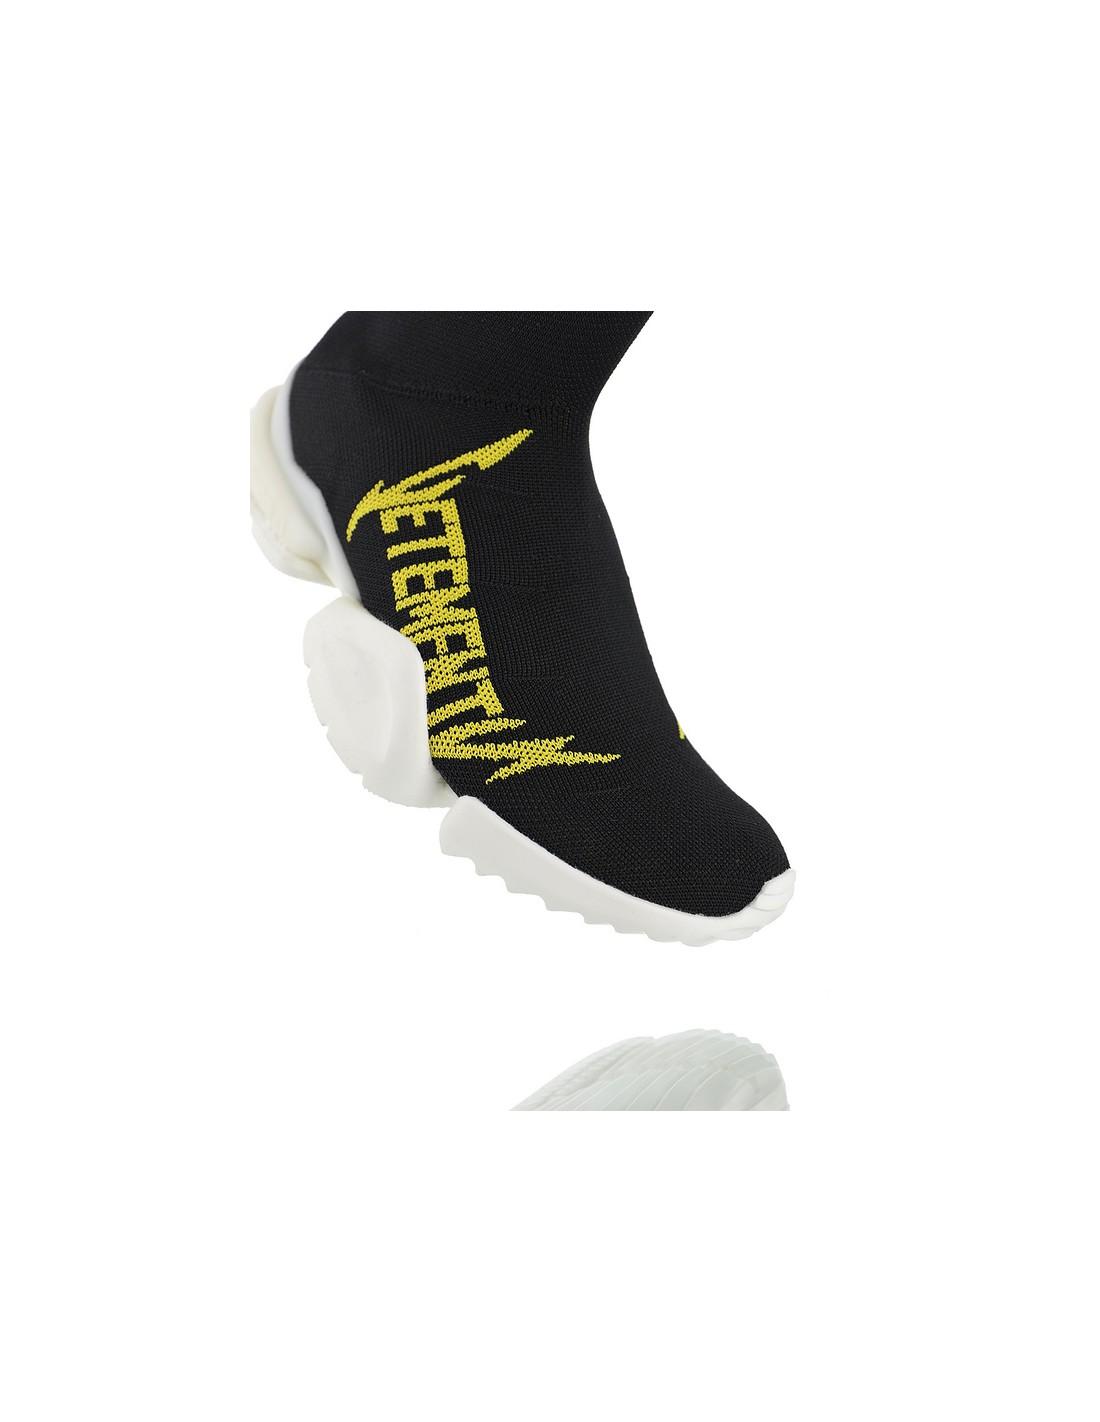 Vetements x Reebok Sock Runner on Feet and In Depth Review